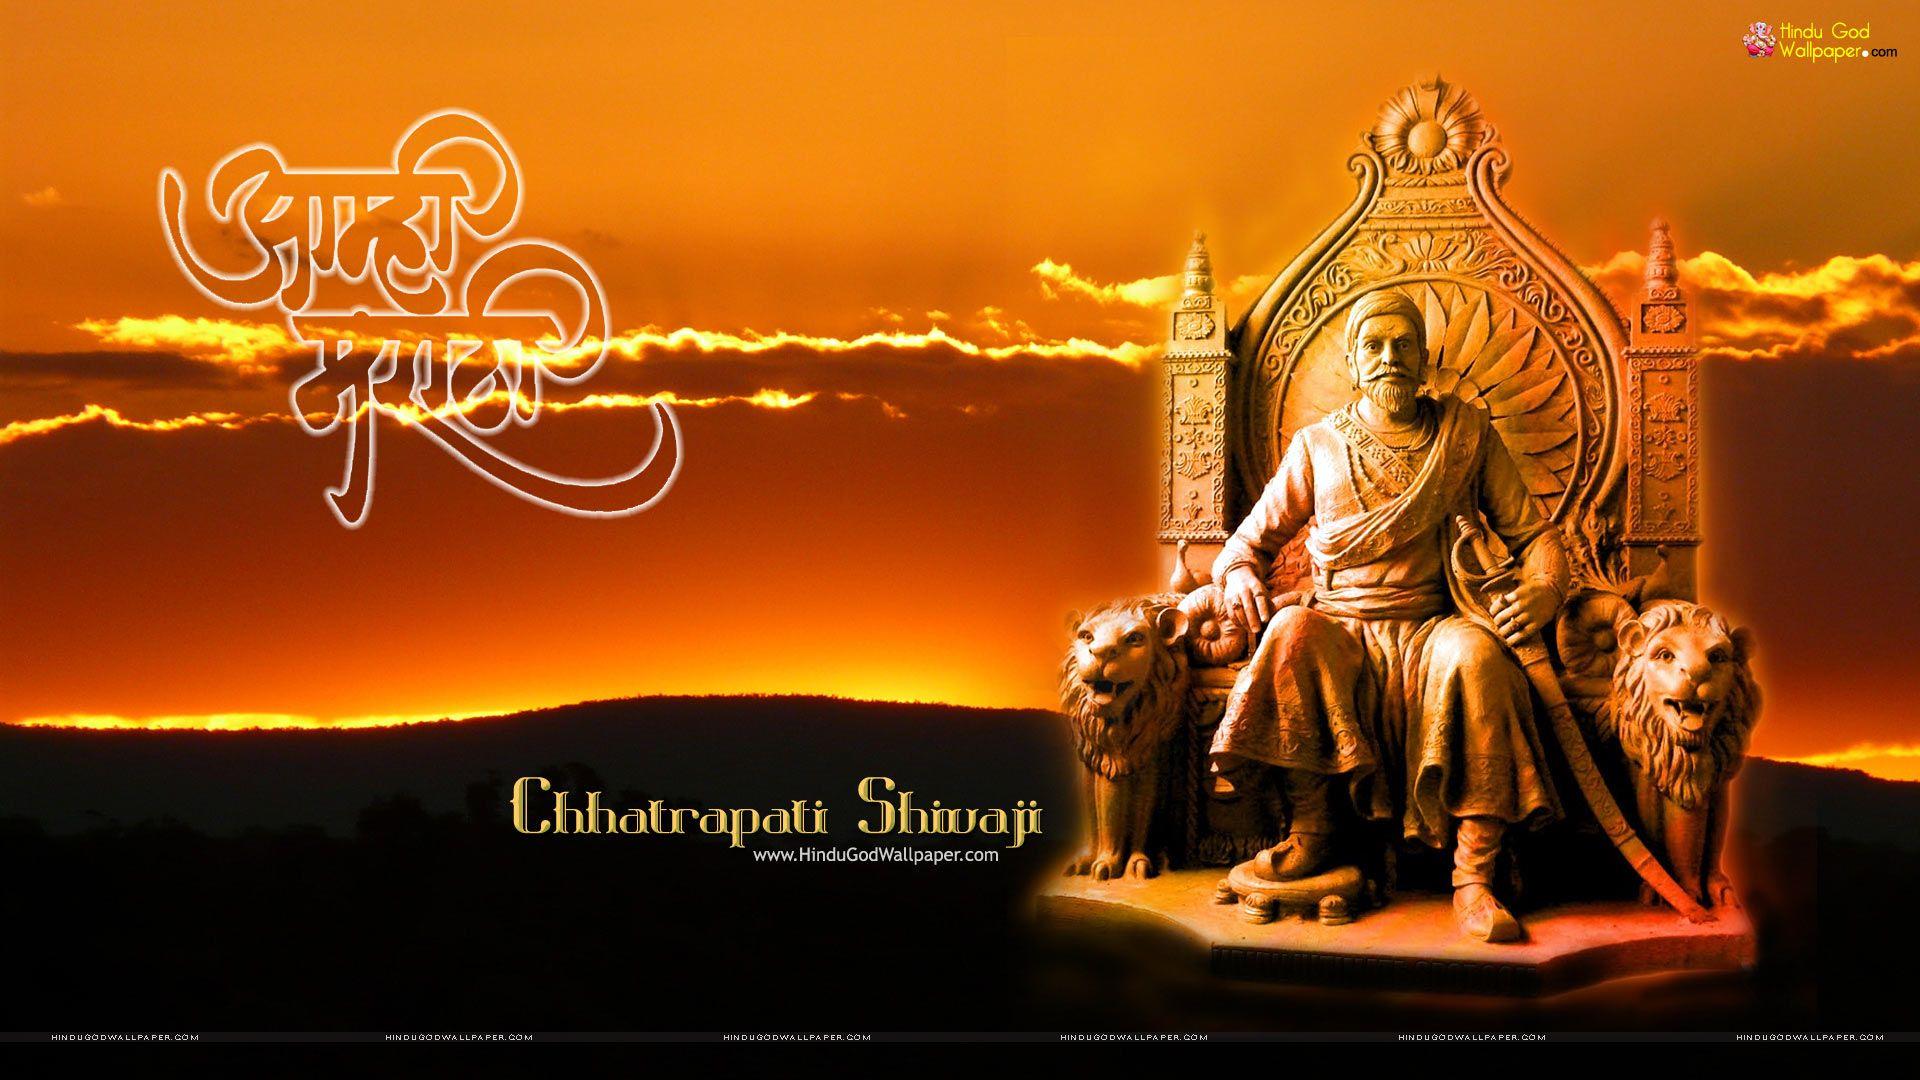 Chatrapati Shivaji Maharaj Wallpaper Free Download - Chhatrapati Shivaji Maharaj Photo Download , HD Wallpaper & Backgrounds